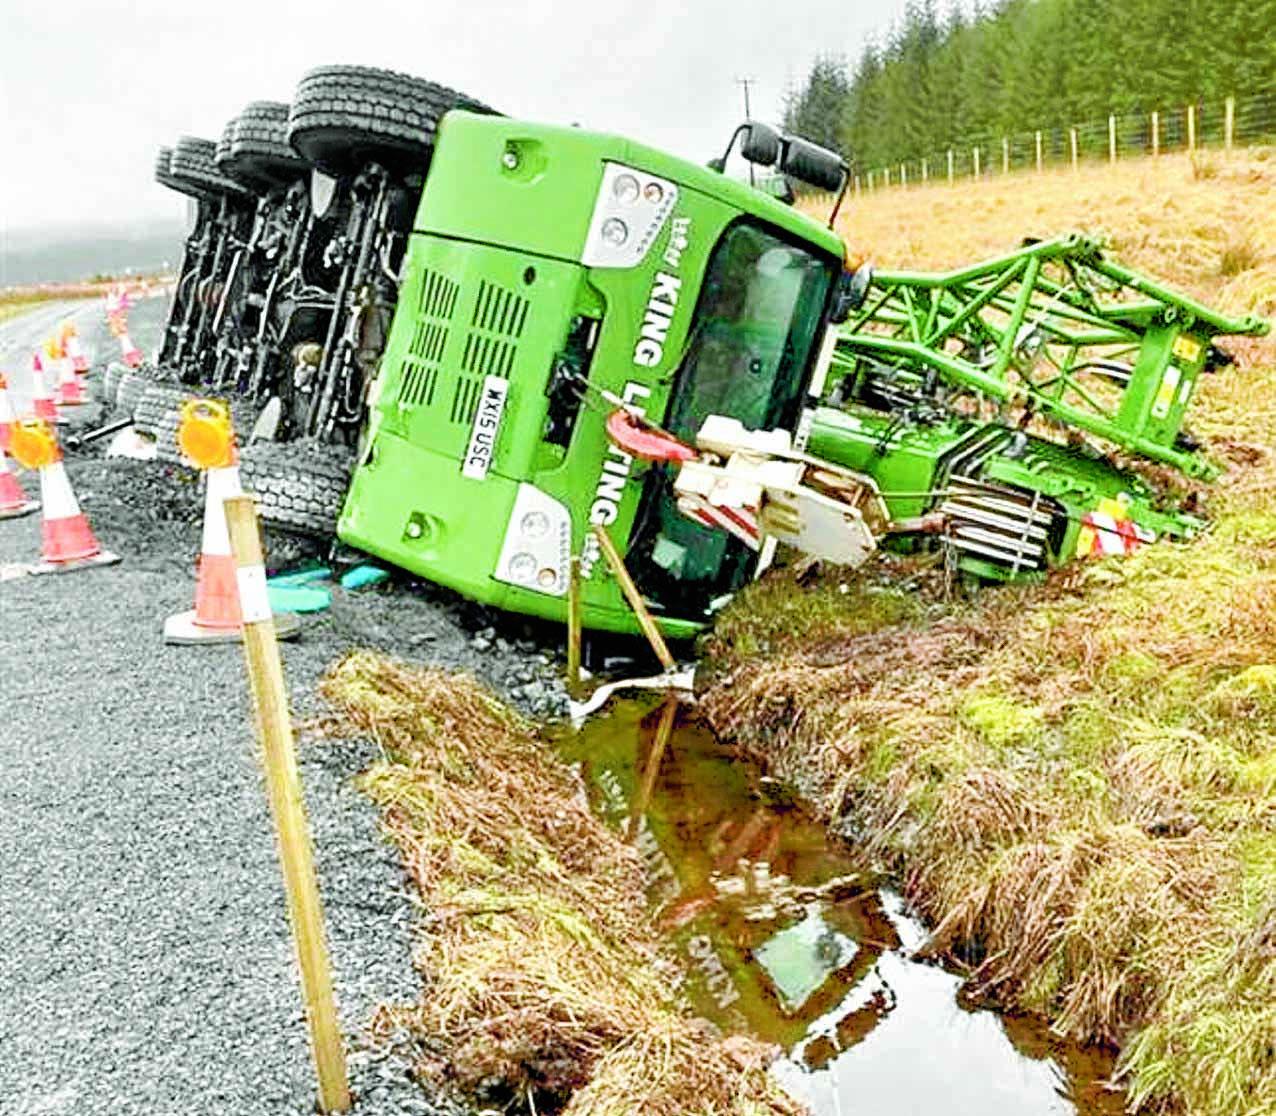 Double crane crash ignites wind farm row